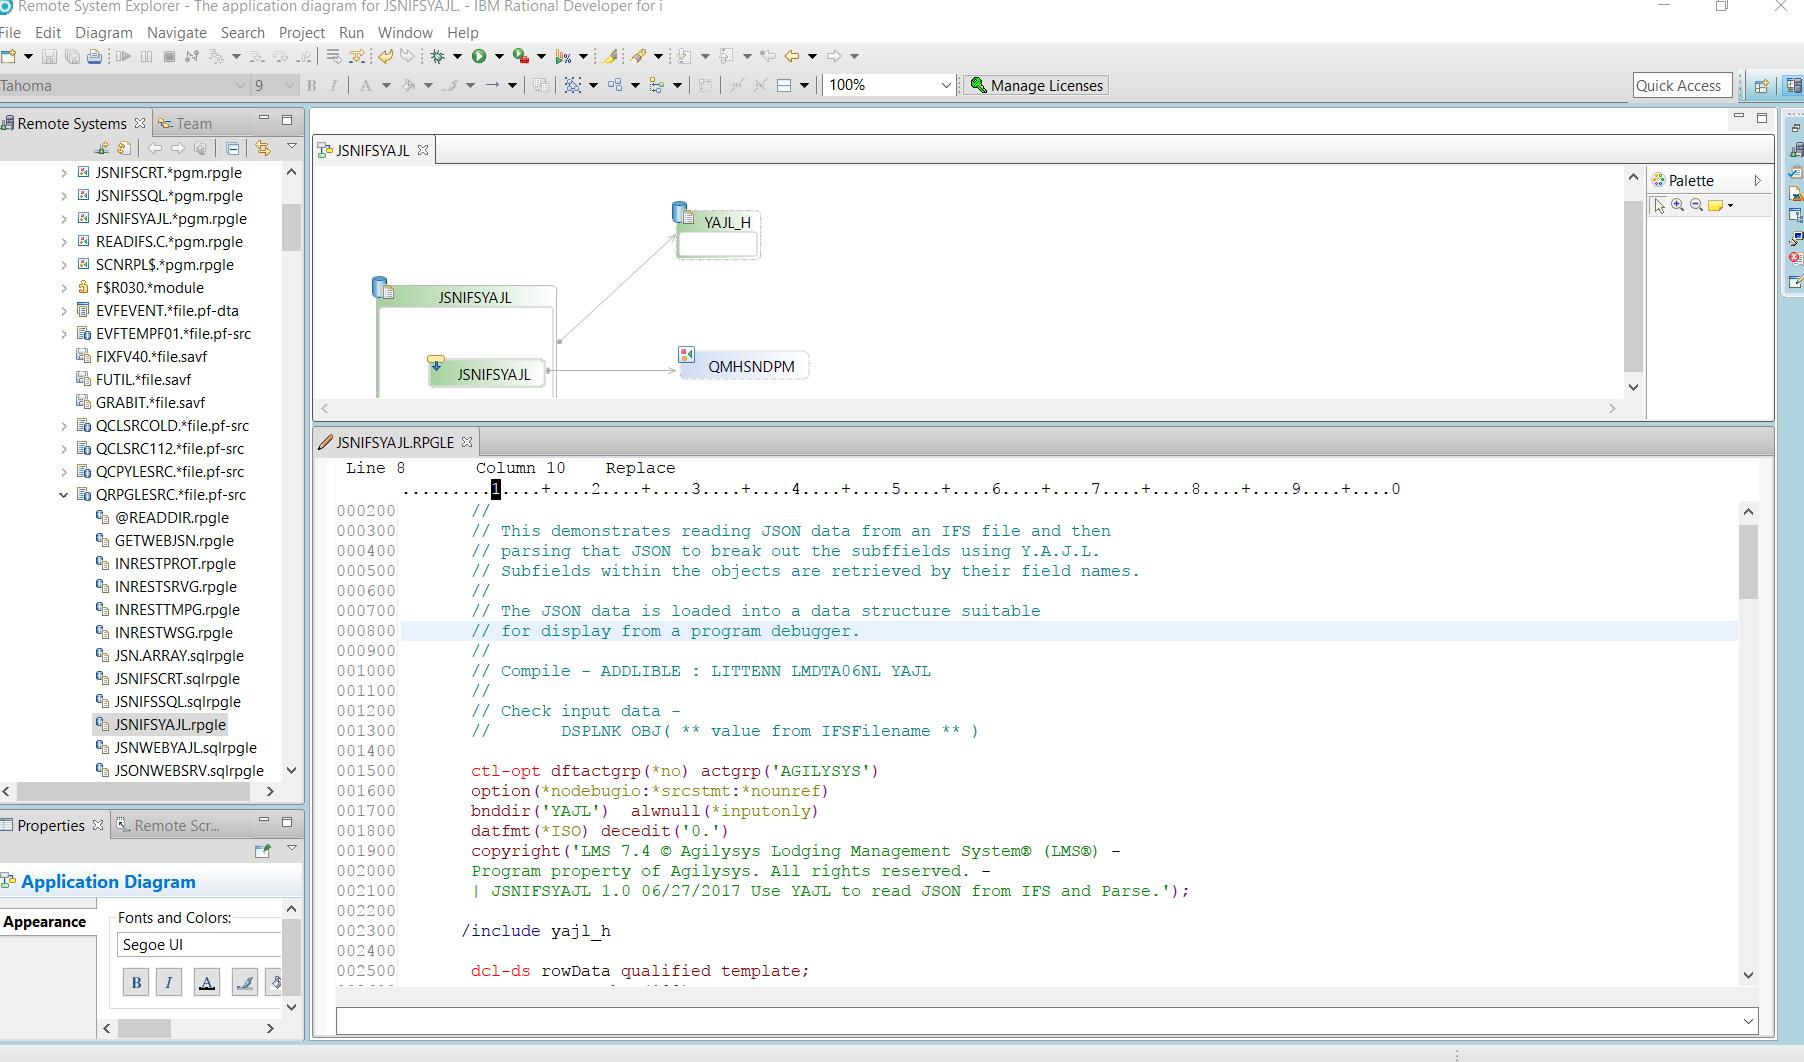 Writing RPG program code using SEU getting error -